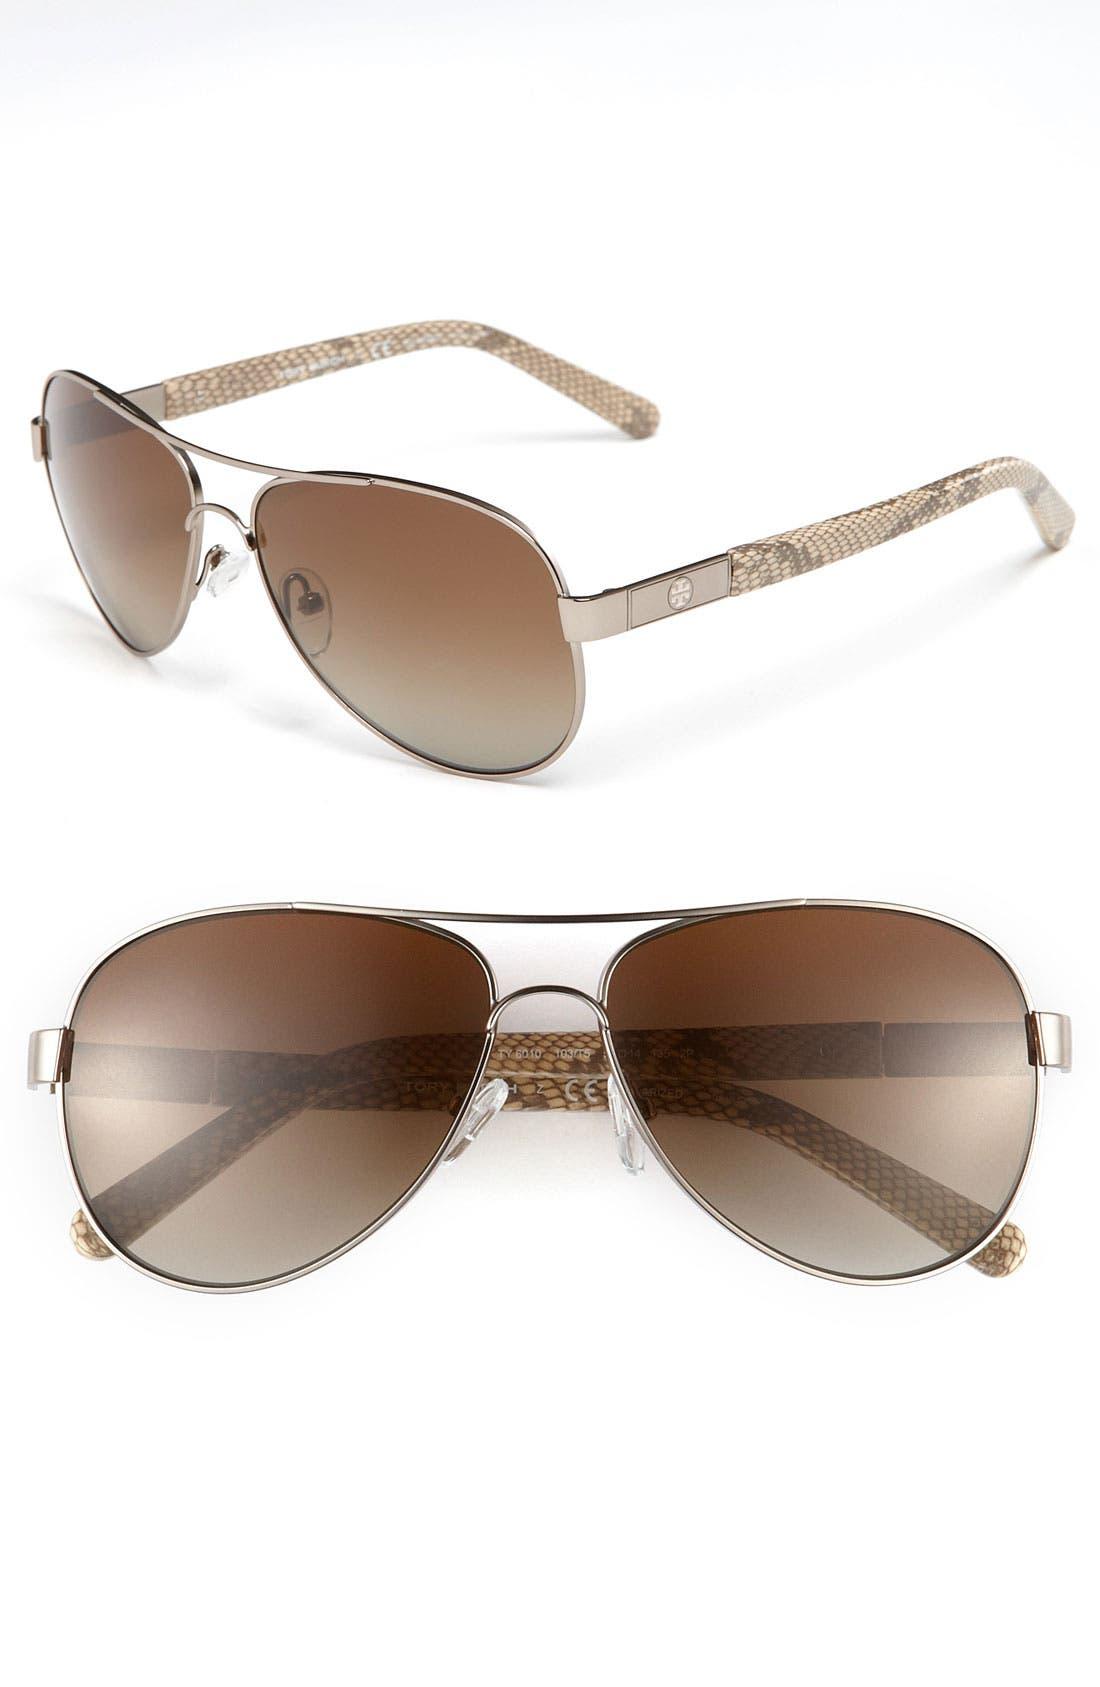 Main Image - Tory Burch 'Small' 57mm Polarized Metal Aviator Sunglasses